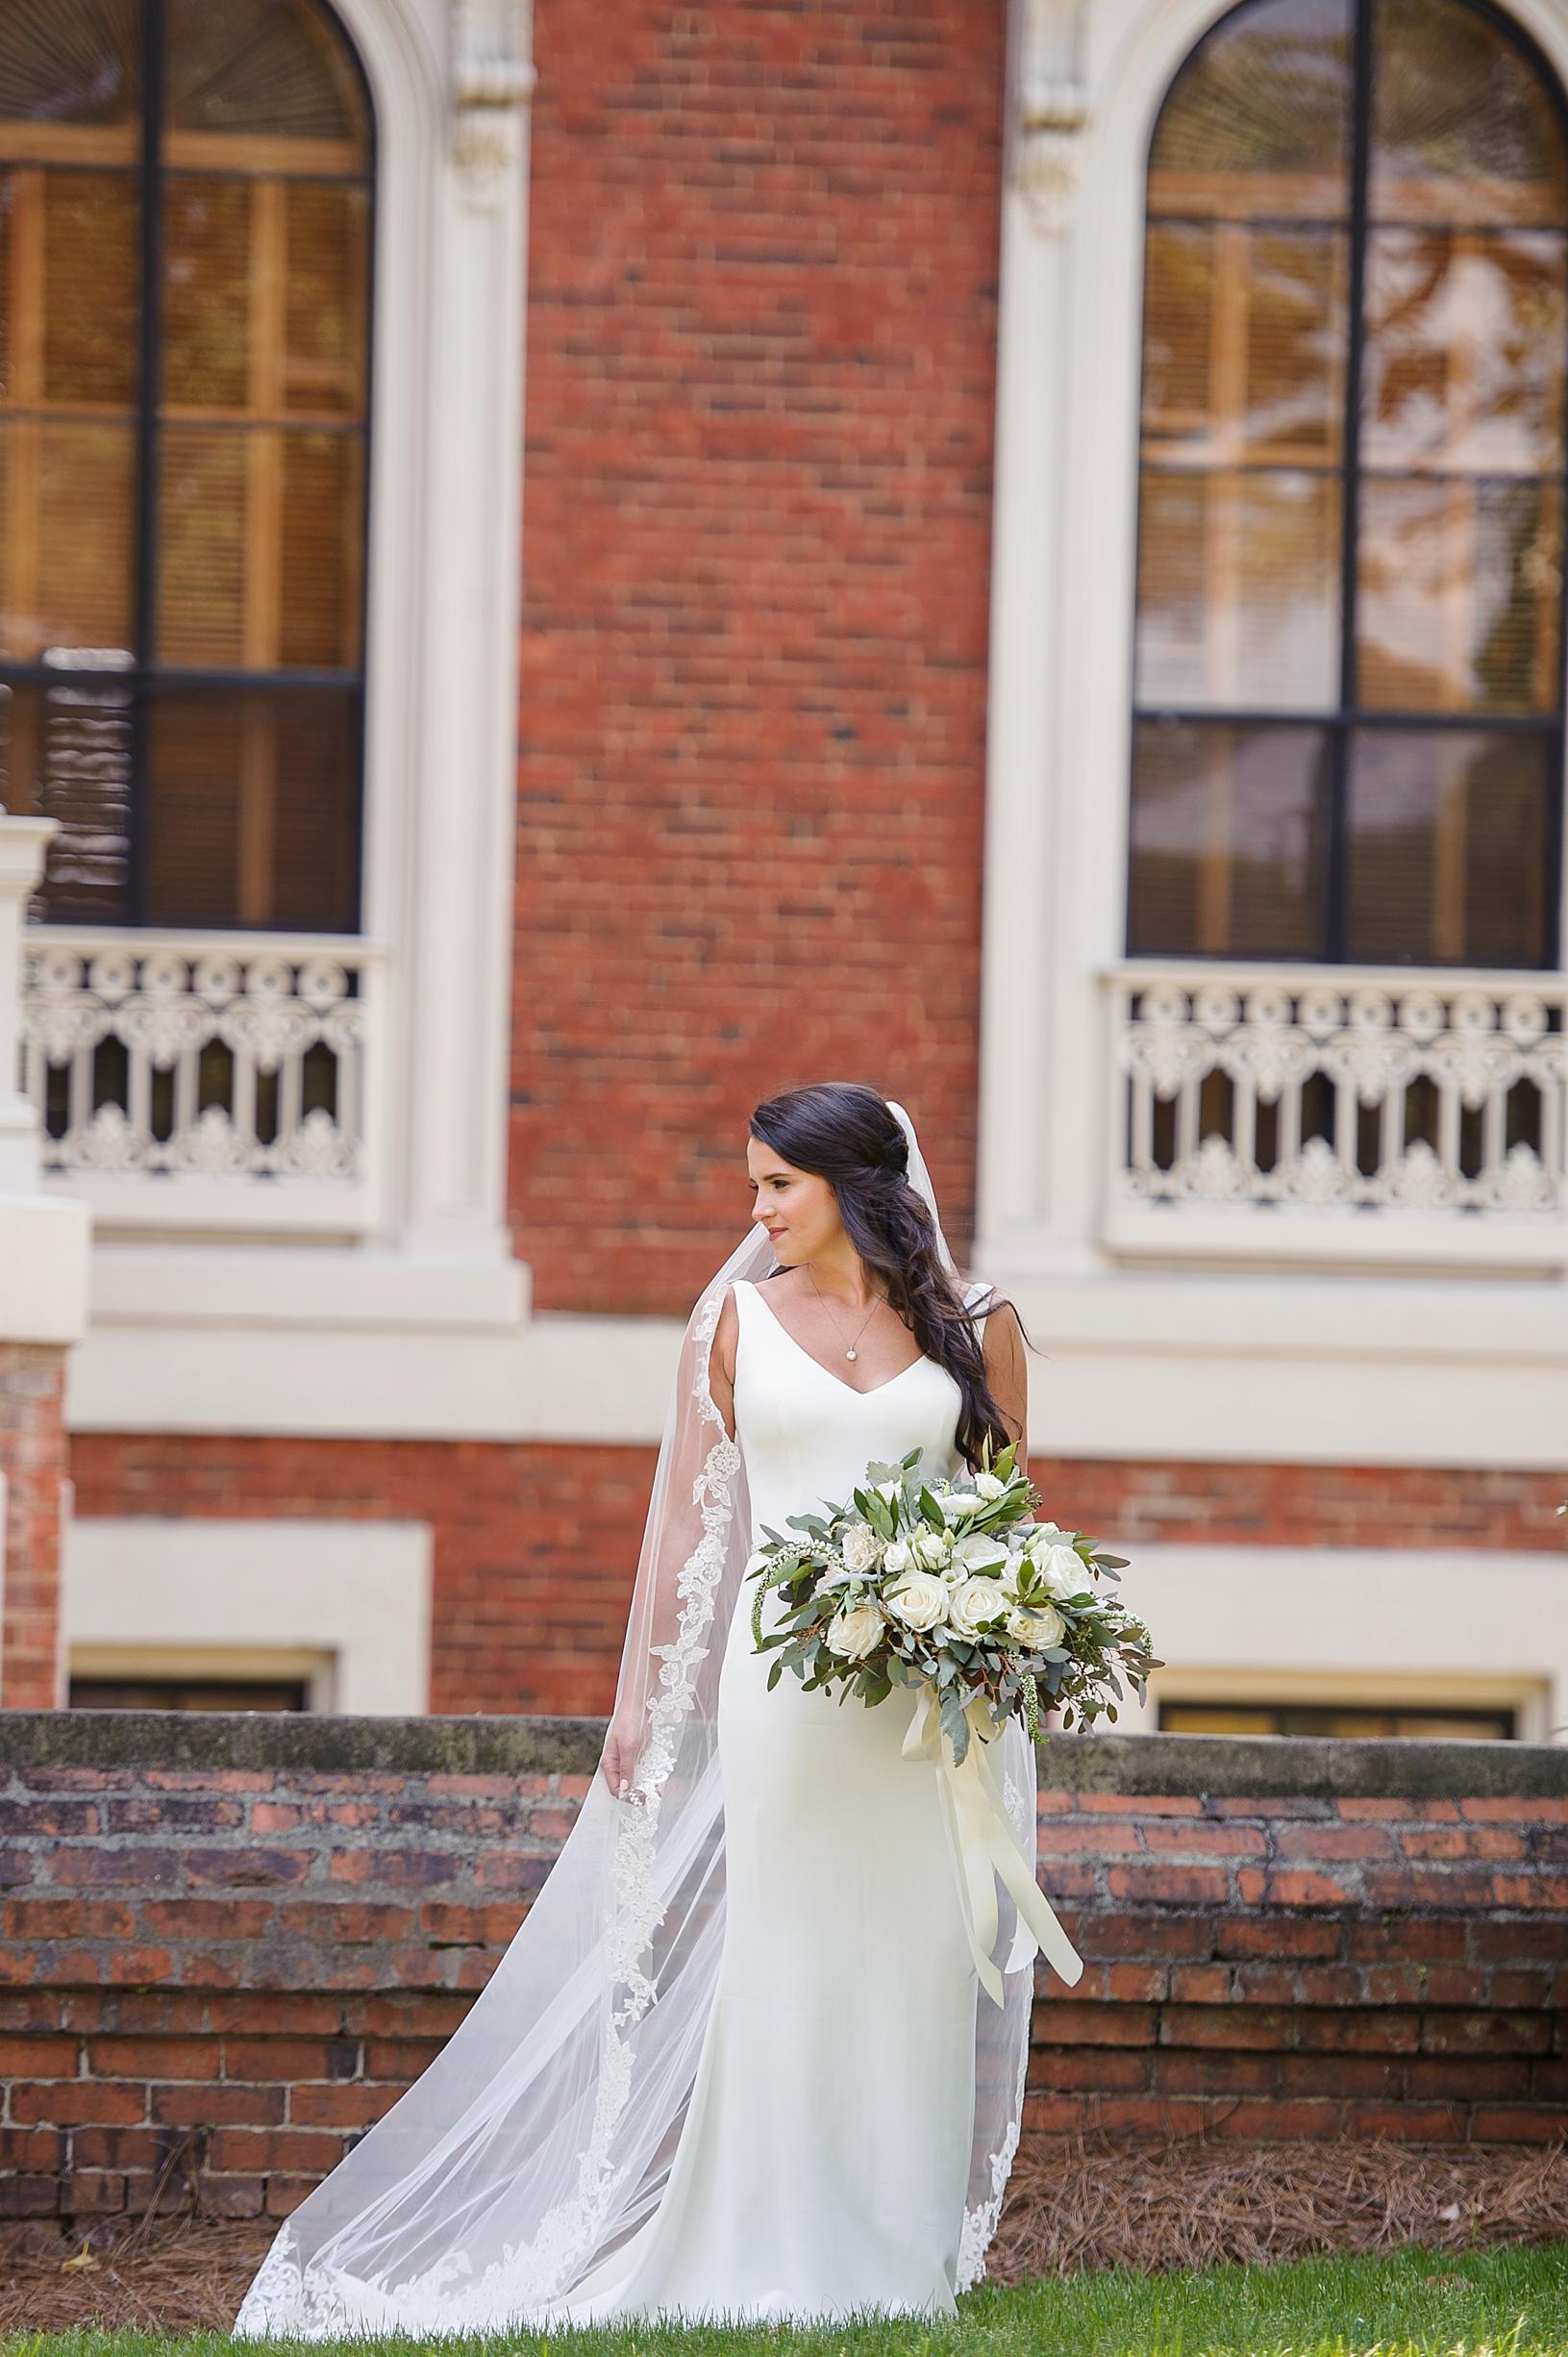 Royal Wedding with Outdoor Reception-11.JPG